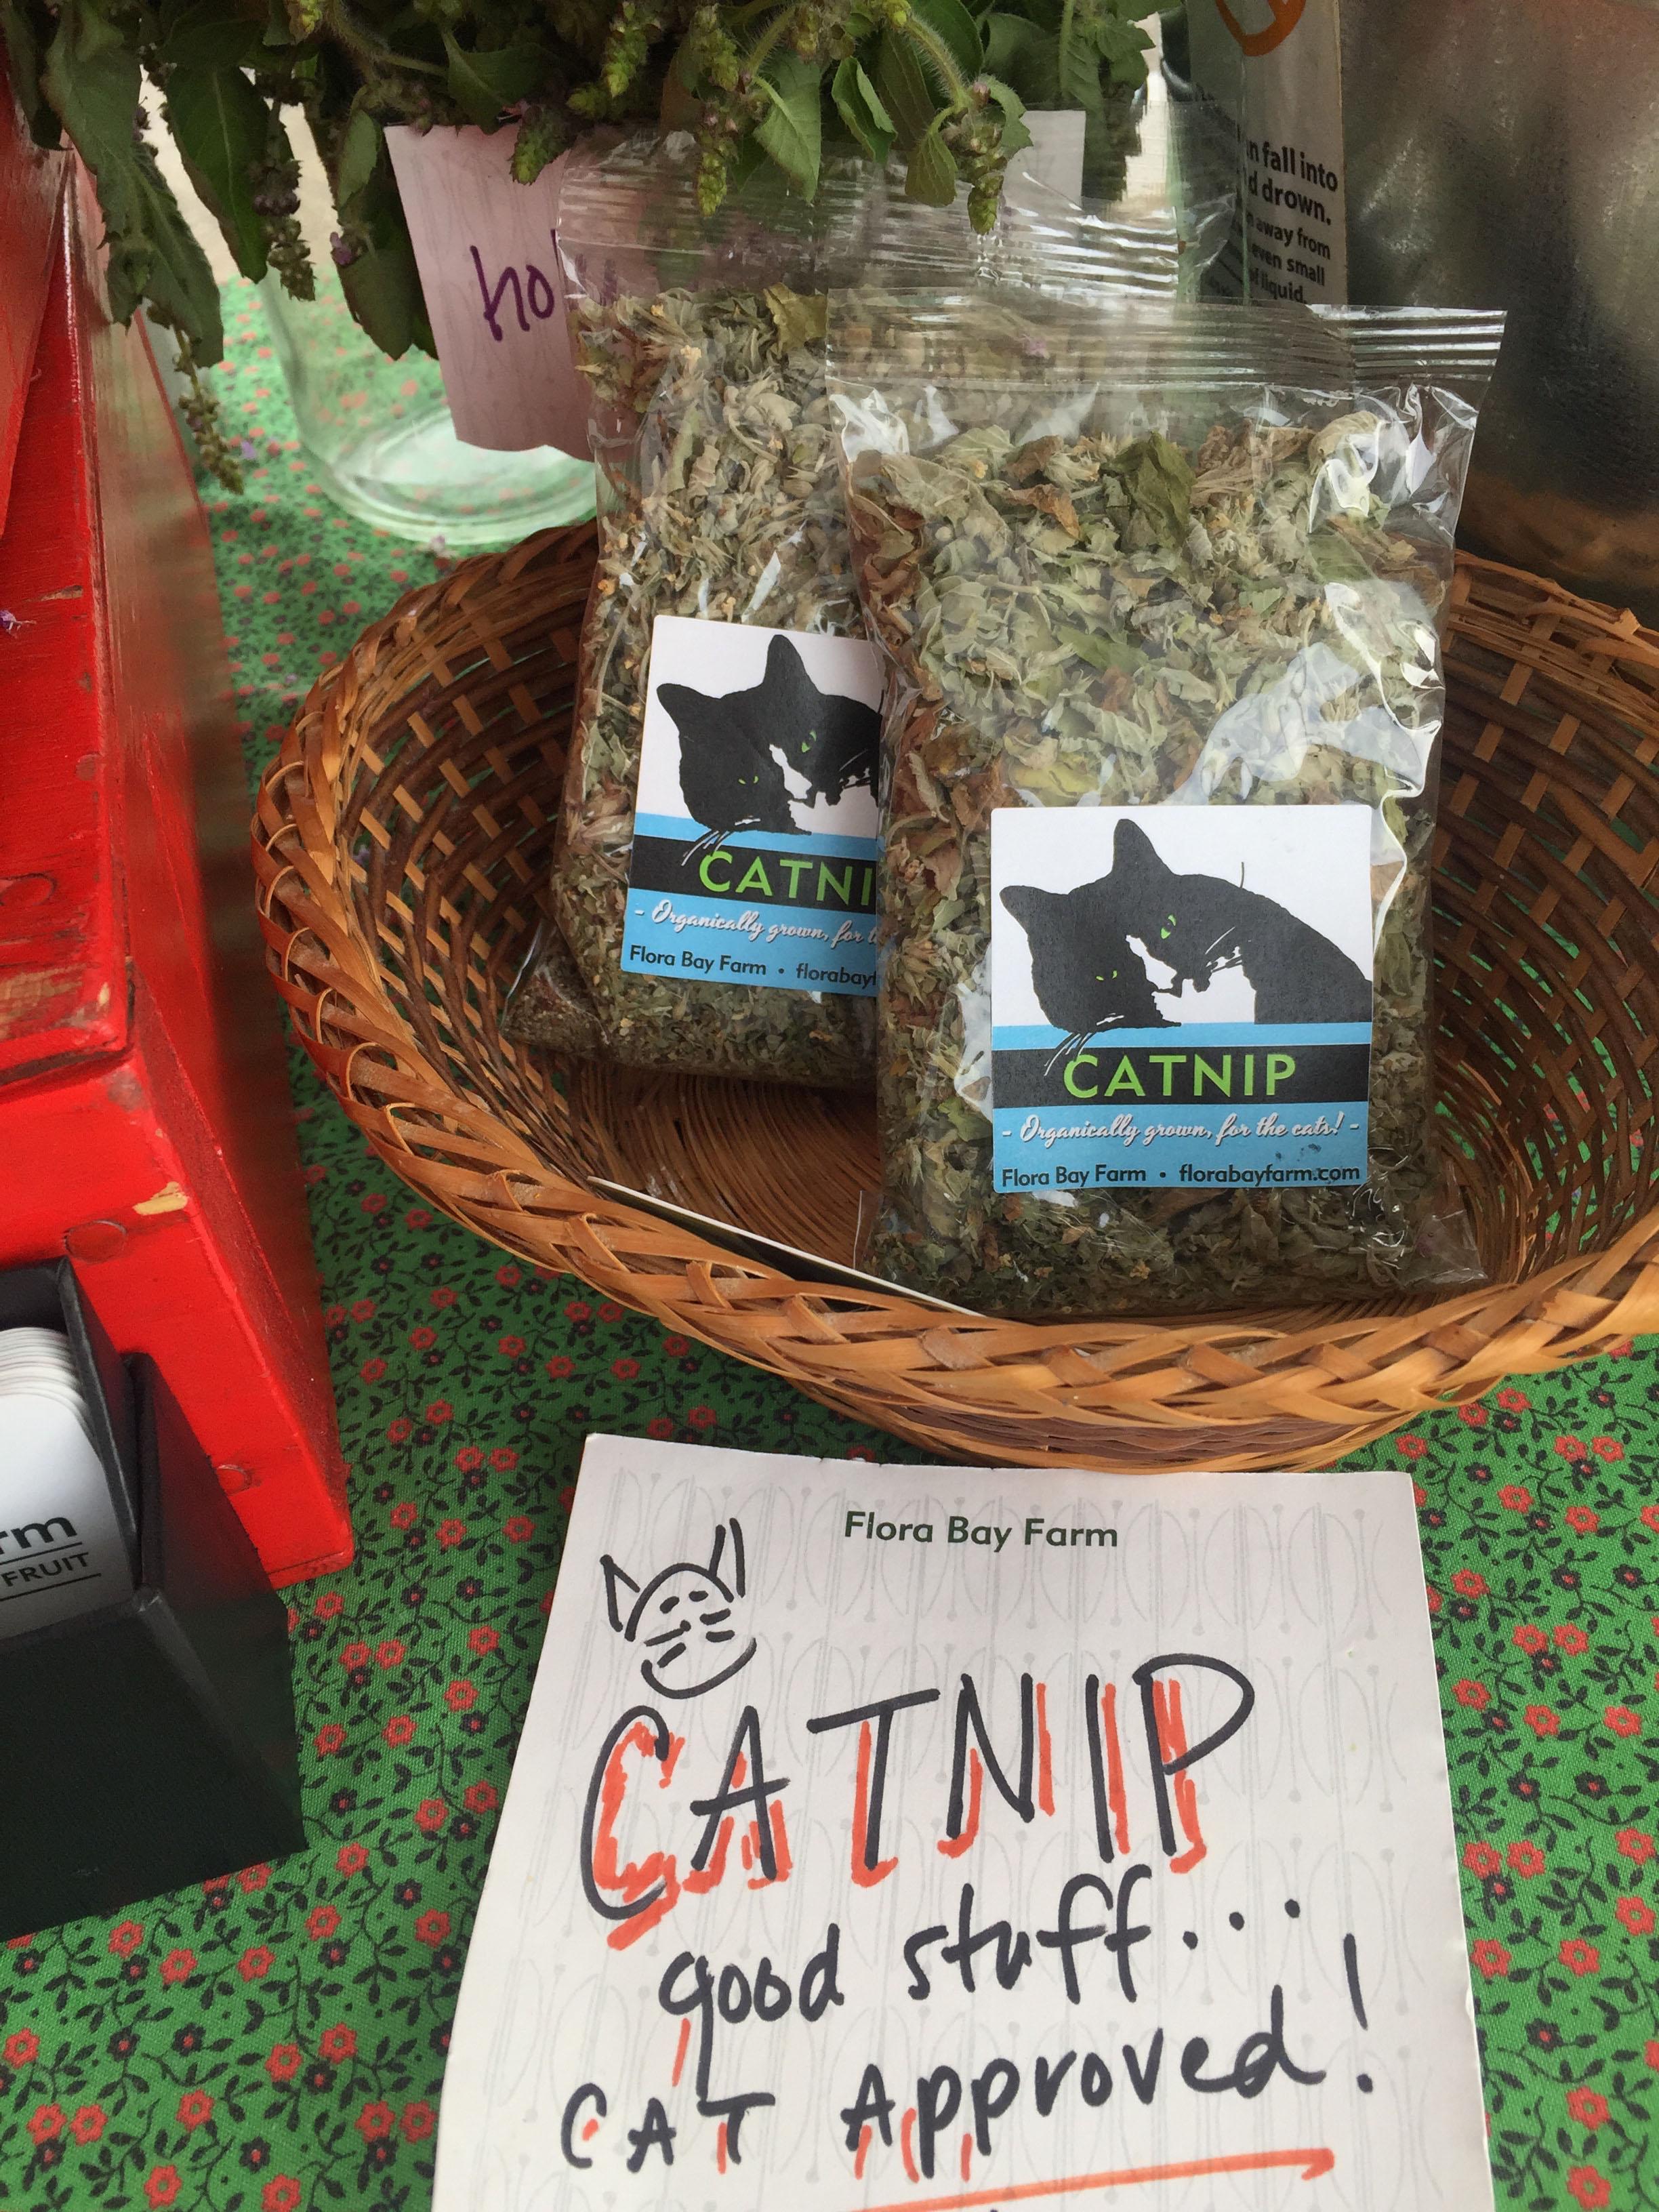 Catnip by Flora Bay Farms